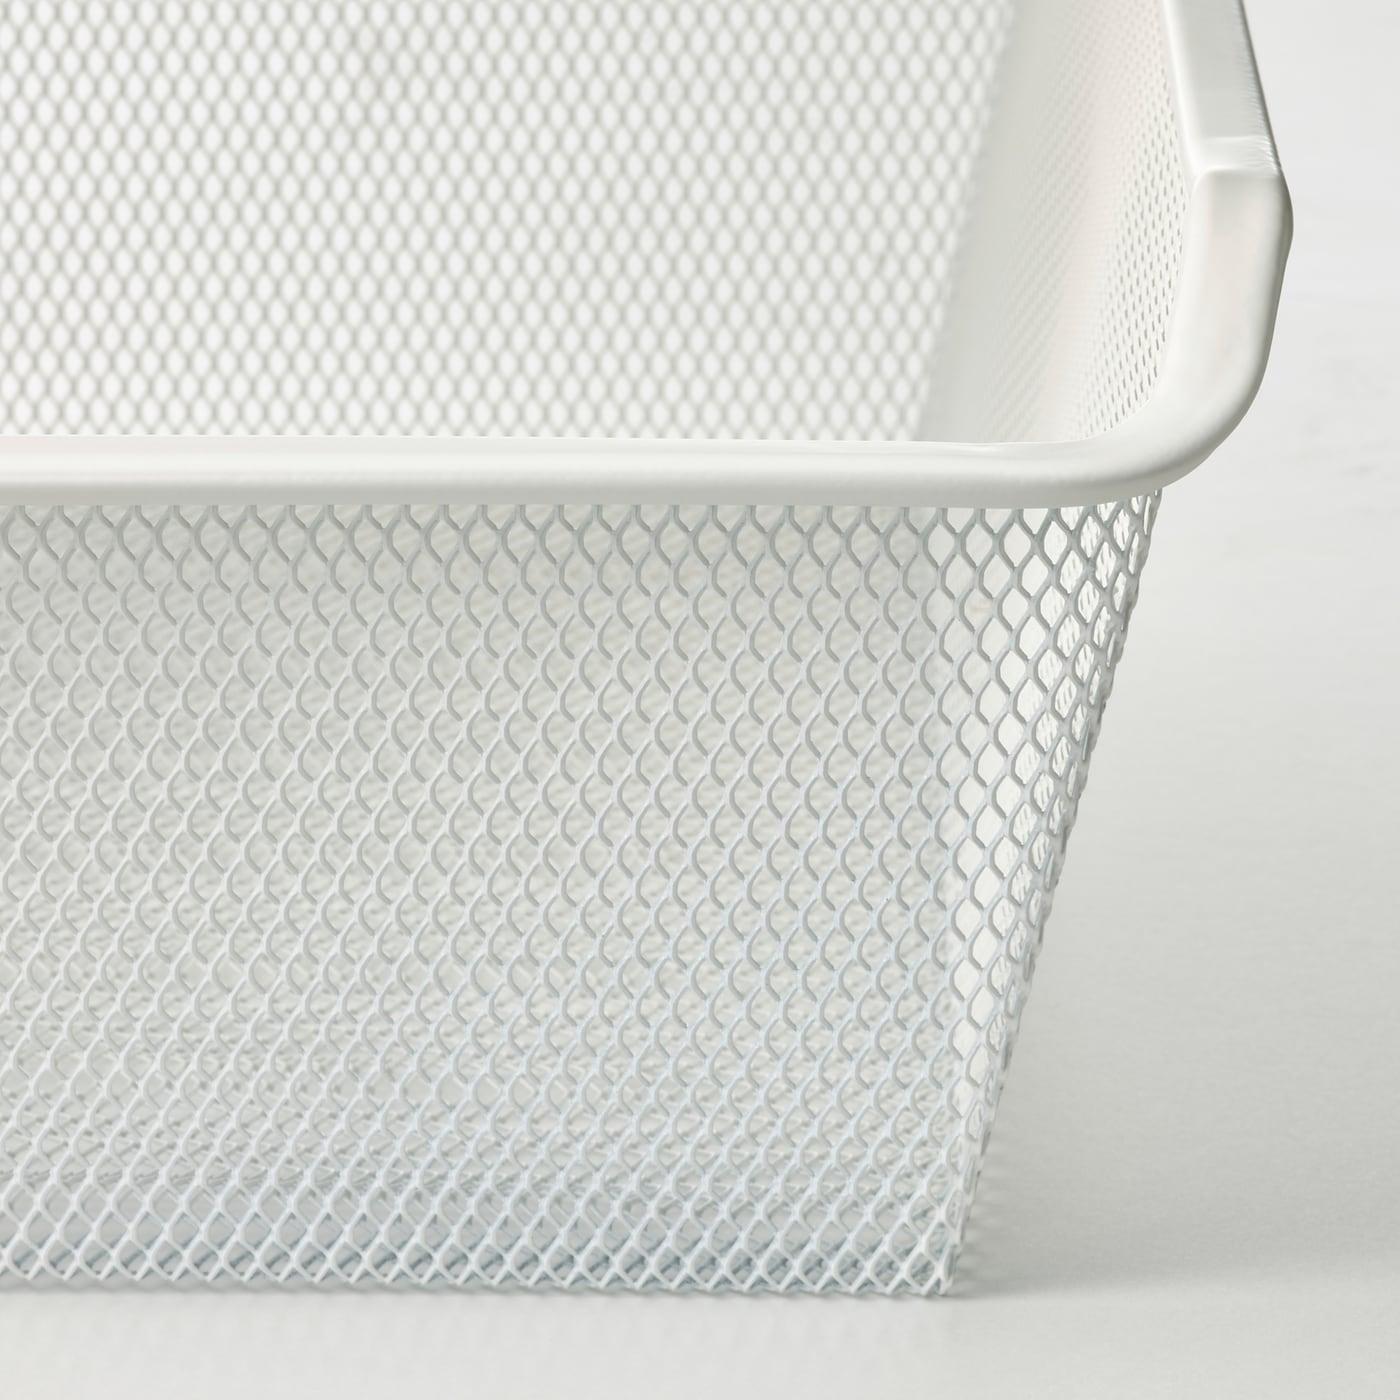 KOMPLEMENT Mesh basket, white, 50x35 cm